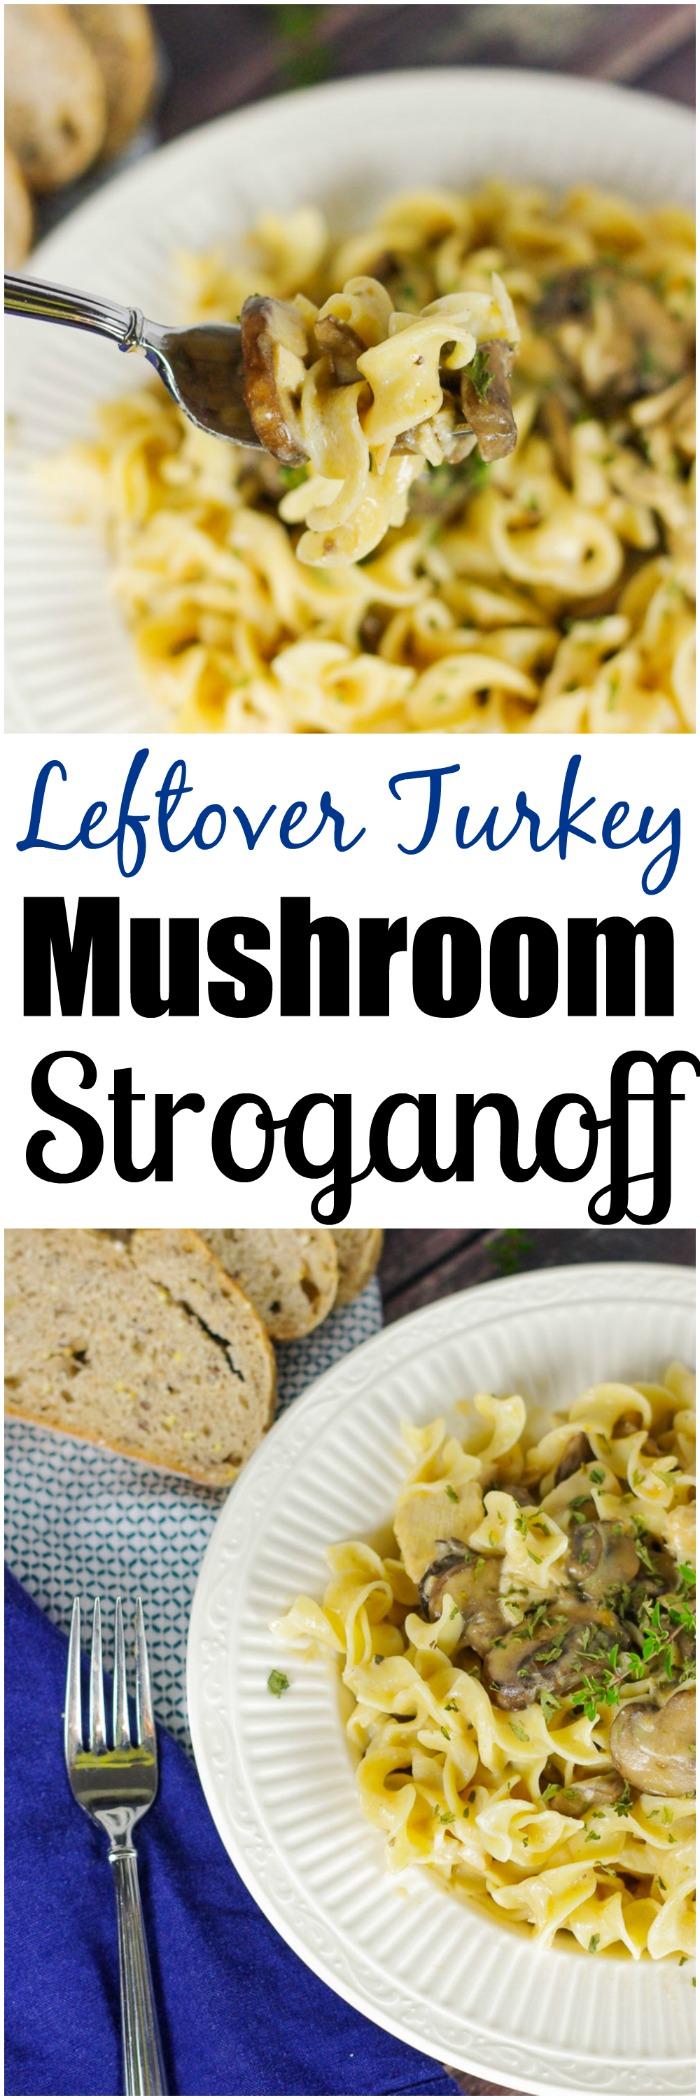 Leftover Turkey Mushroom Stroganoff | www.homeandplate.com | Make good use of leftover Thanksgiving turkey with this easy, saucy turkey mushroom stroganoff.